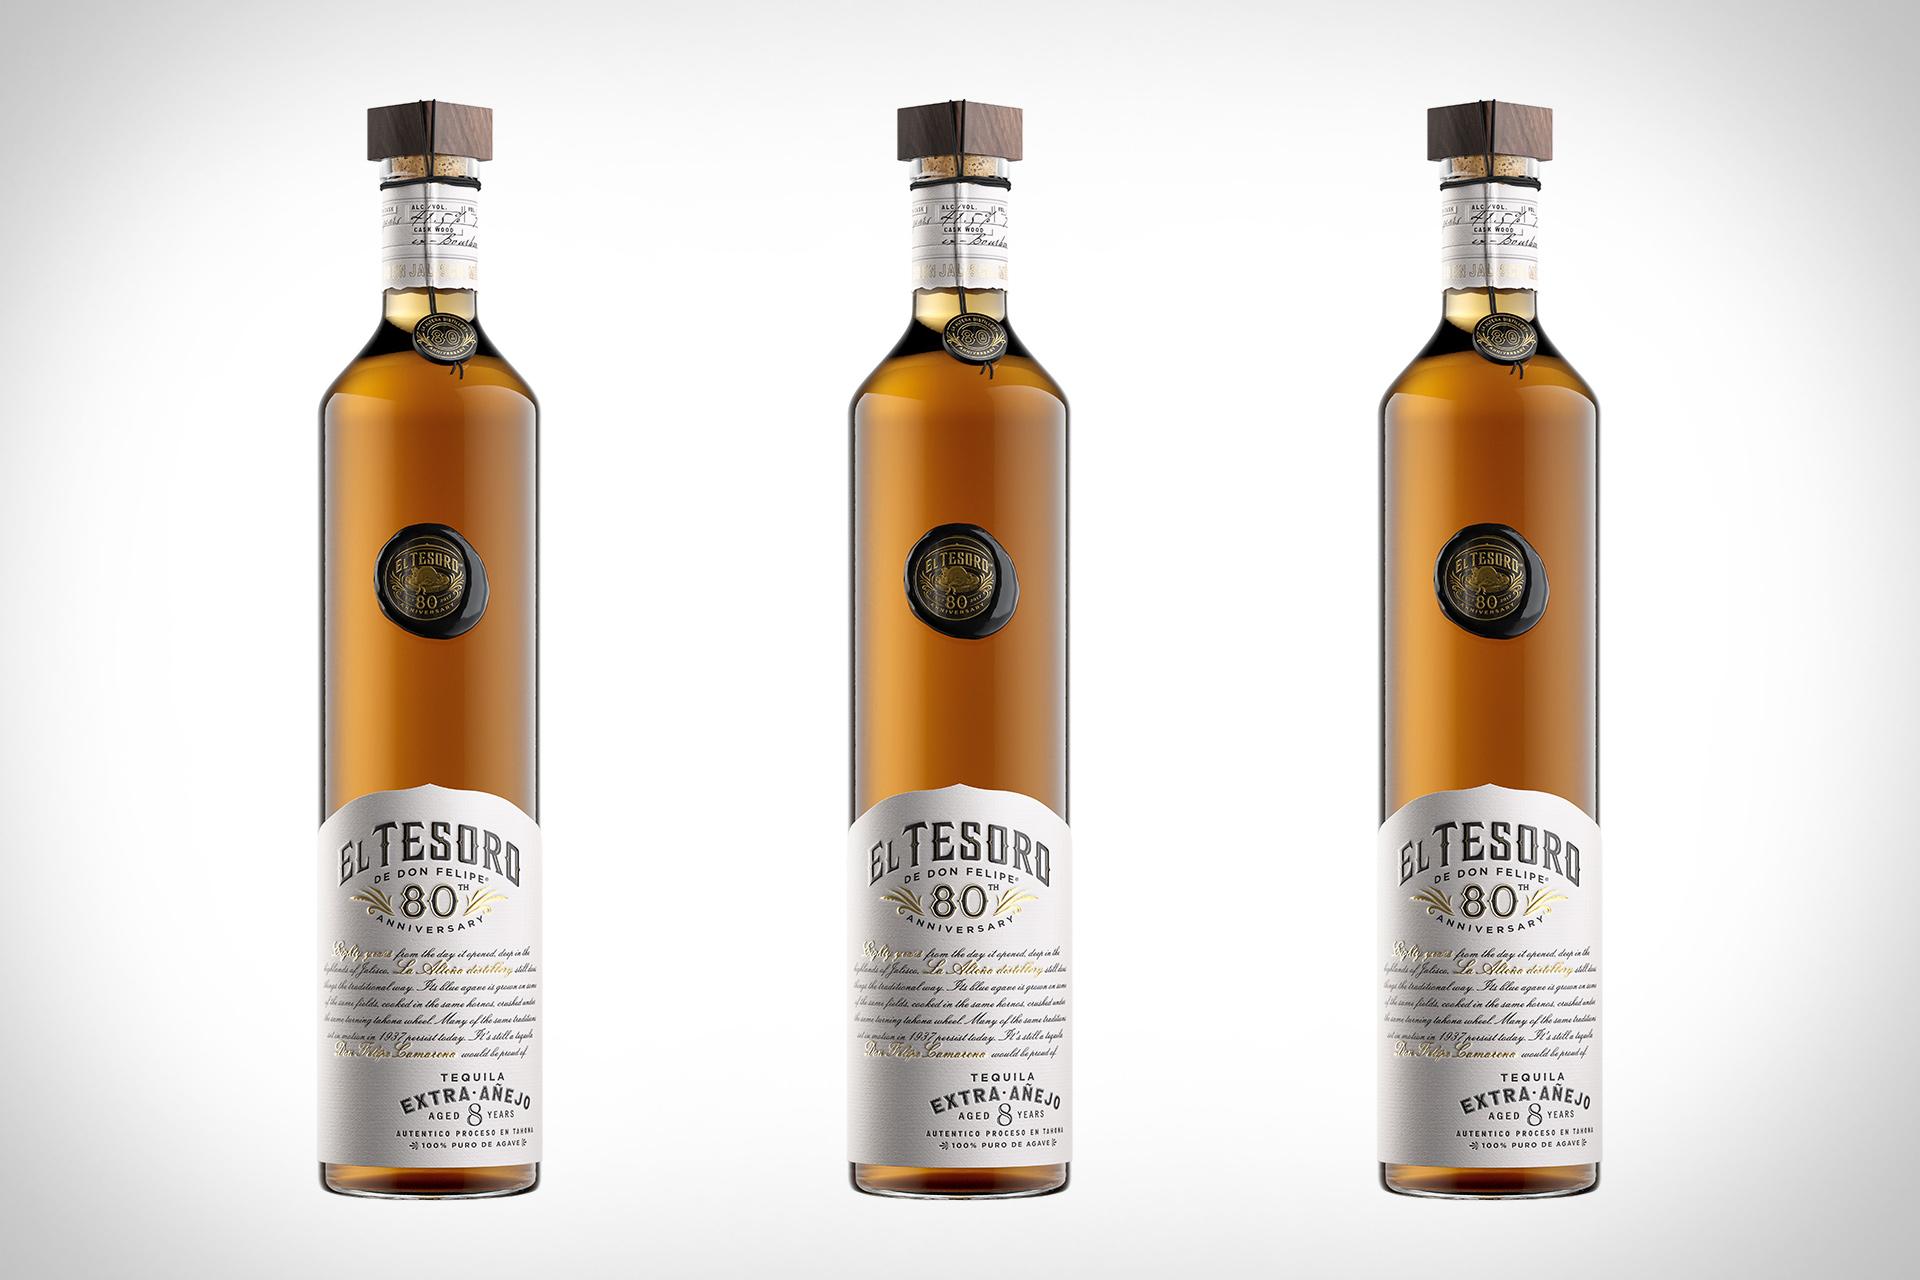 El Tesoro 80th Anniversary Tequila